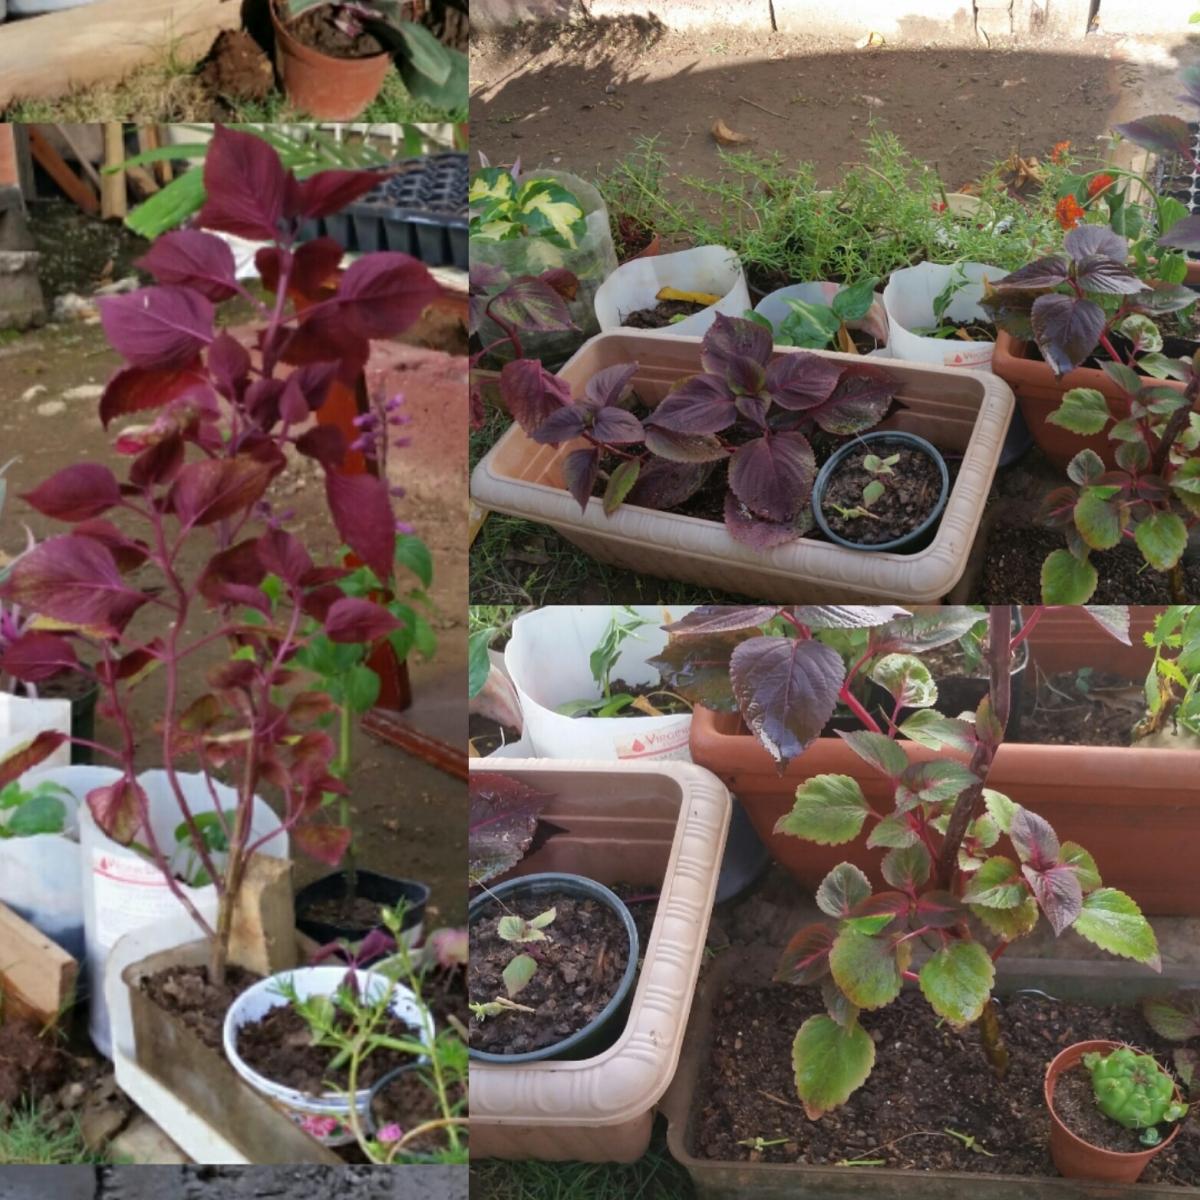 Jamaican Urban Organic Farming: Pruning, A Necessary Evil